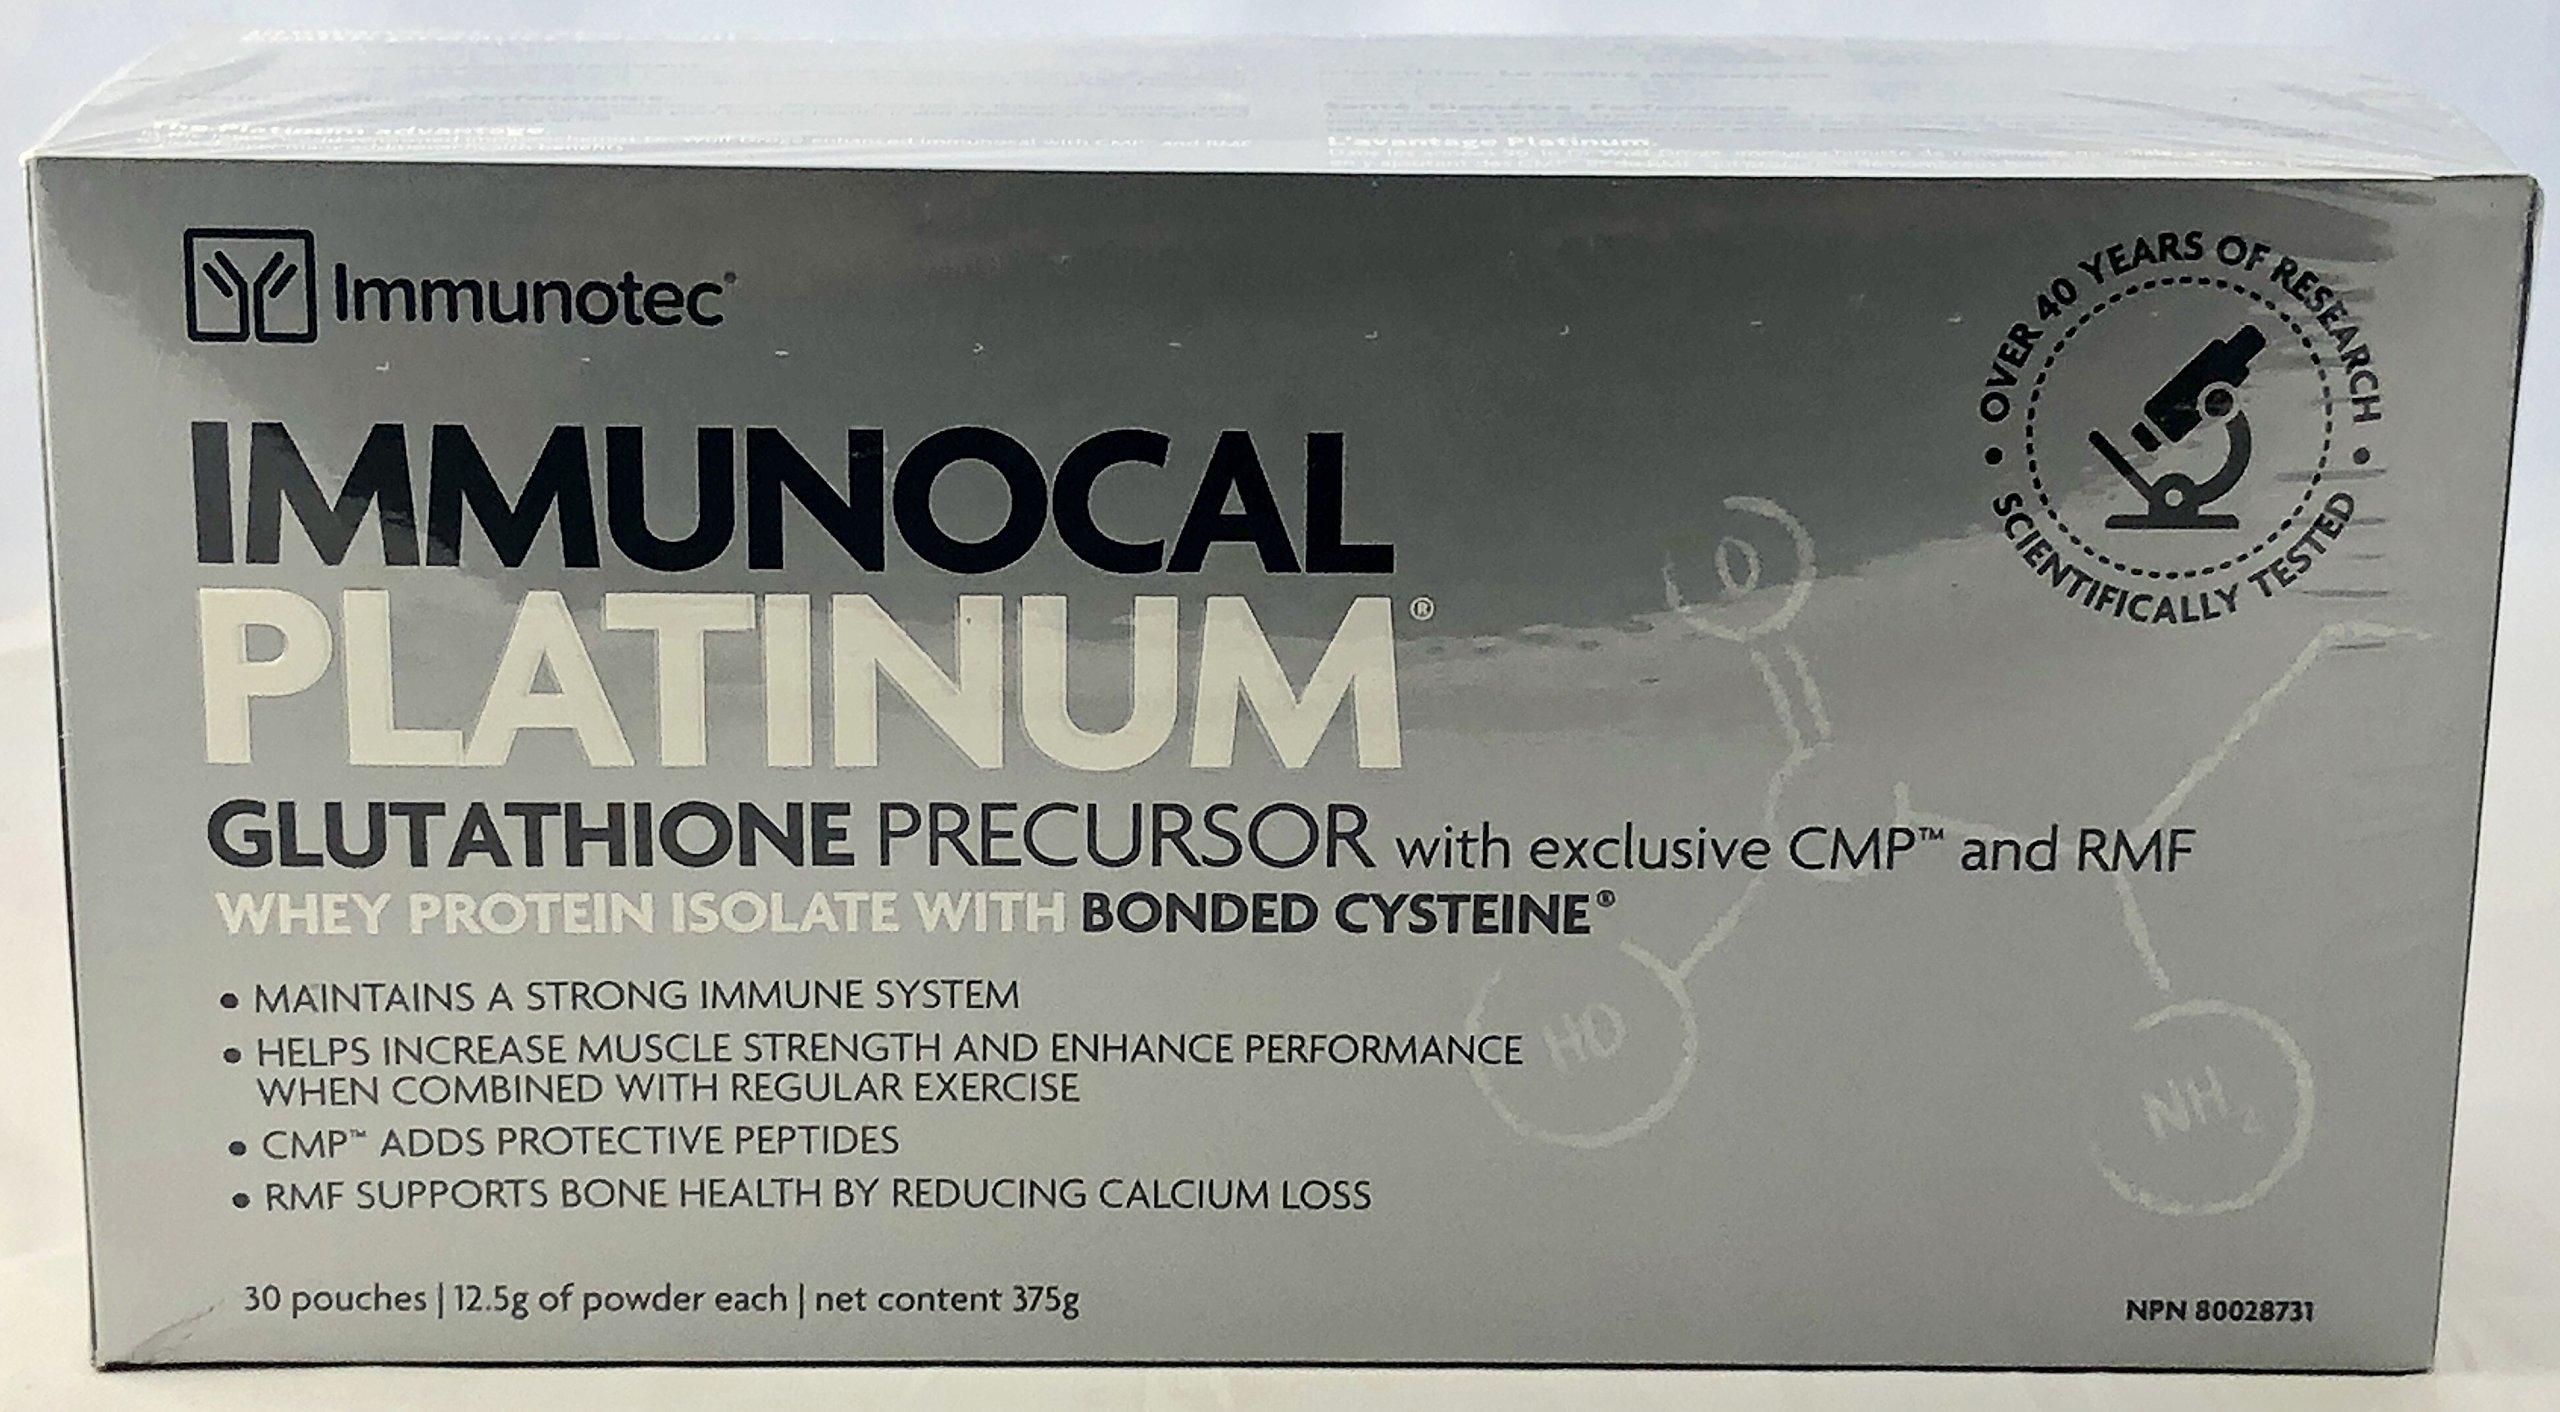 Immunocal Platinum by Immunotec - 30 pouches (0.44 oz/12.5 g each) [CANADA]